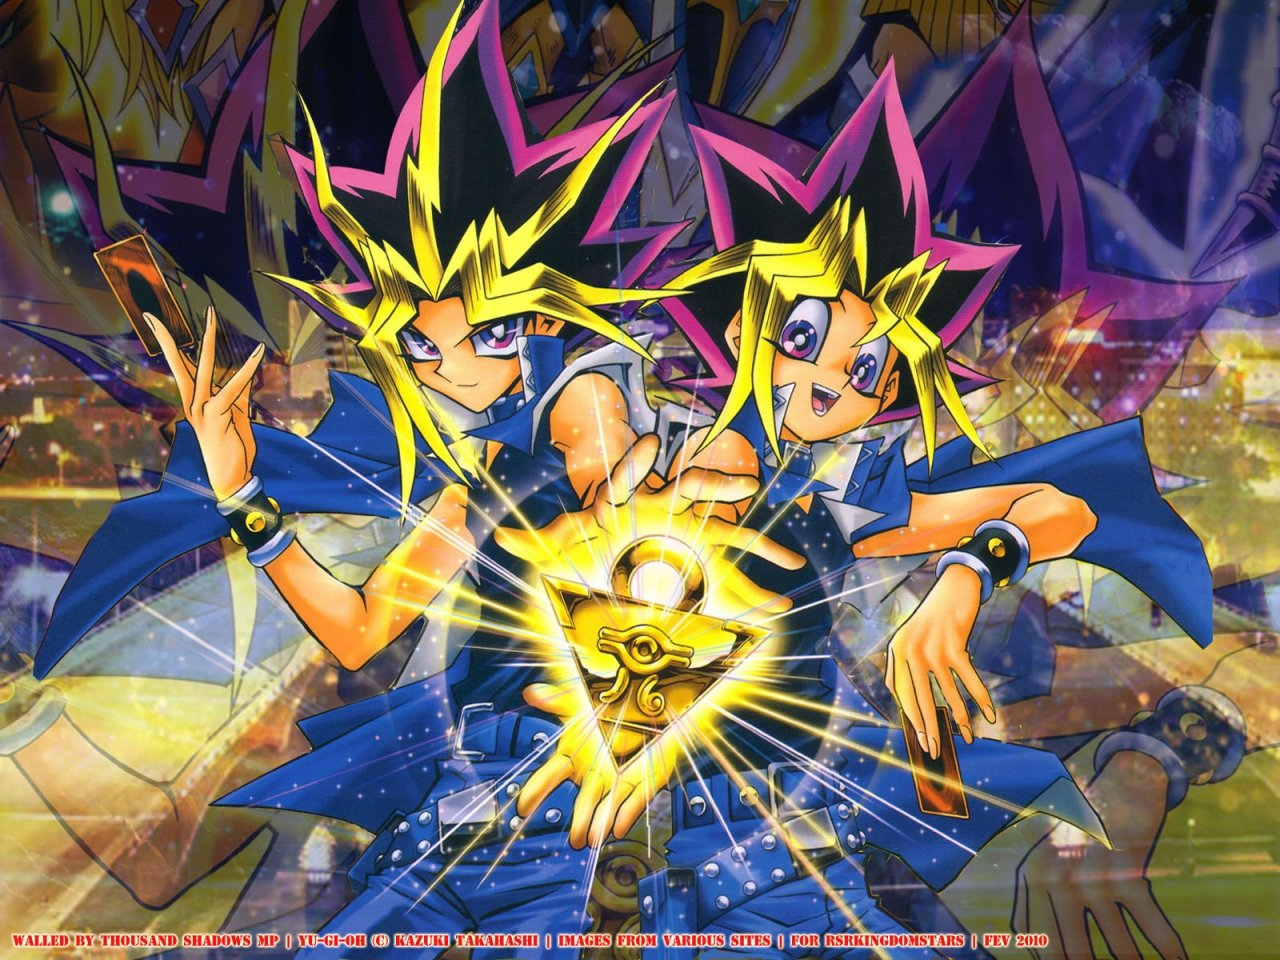 yu gi oh or yu gi oh duel monsters in japan 1280x960